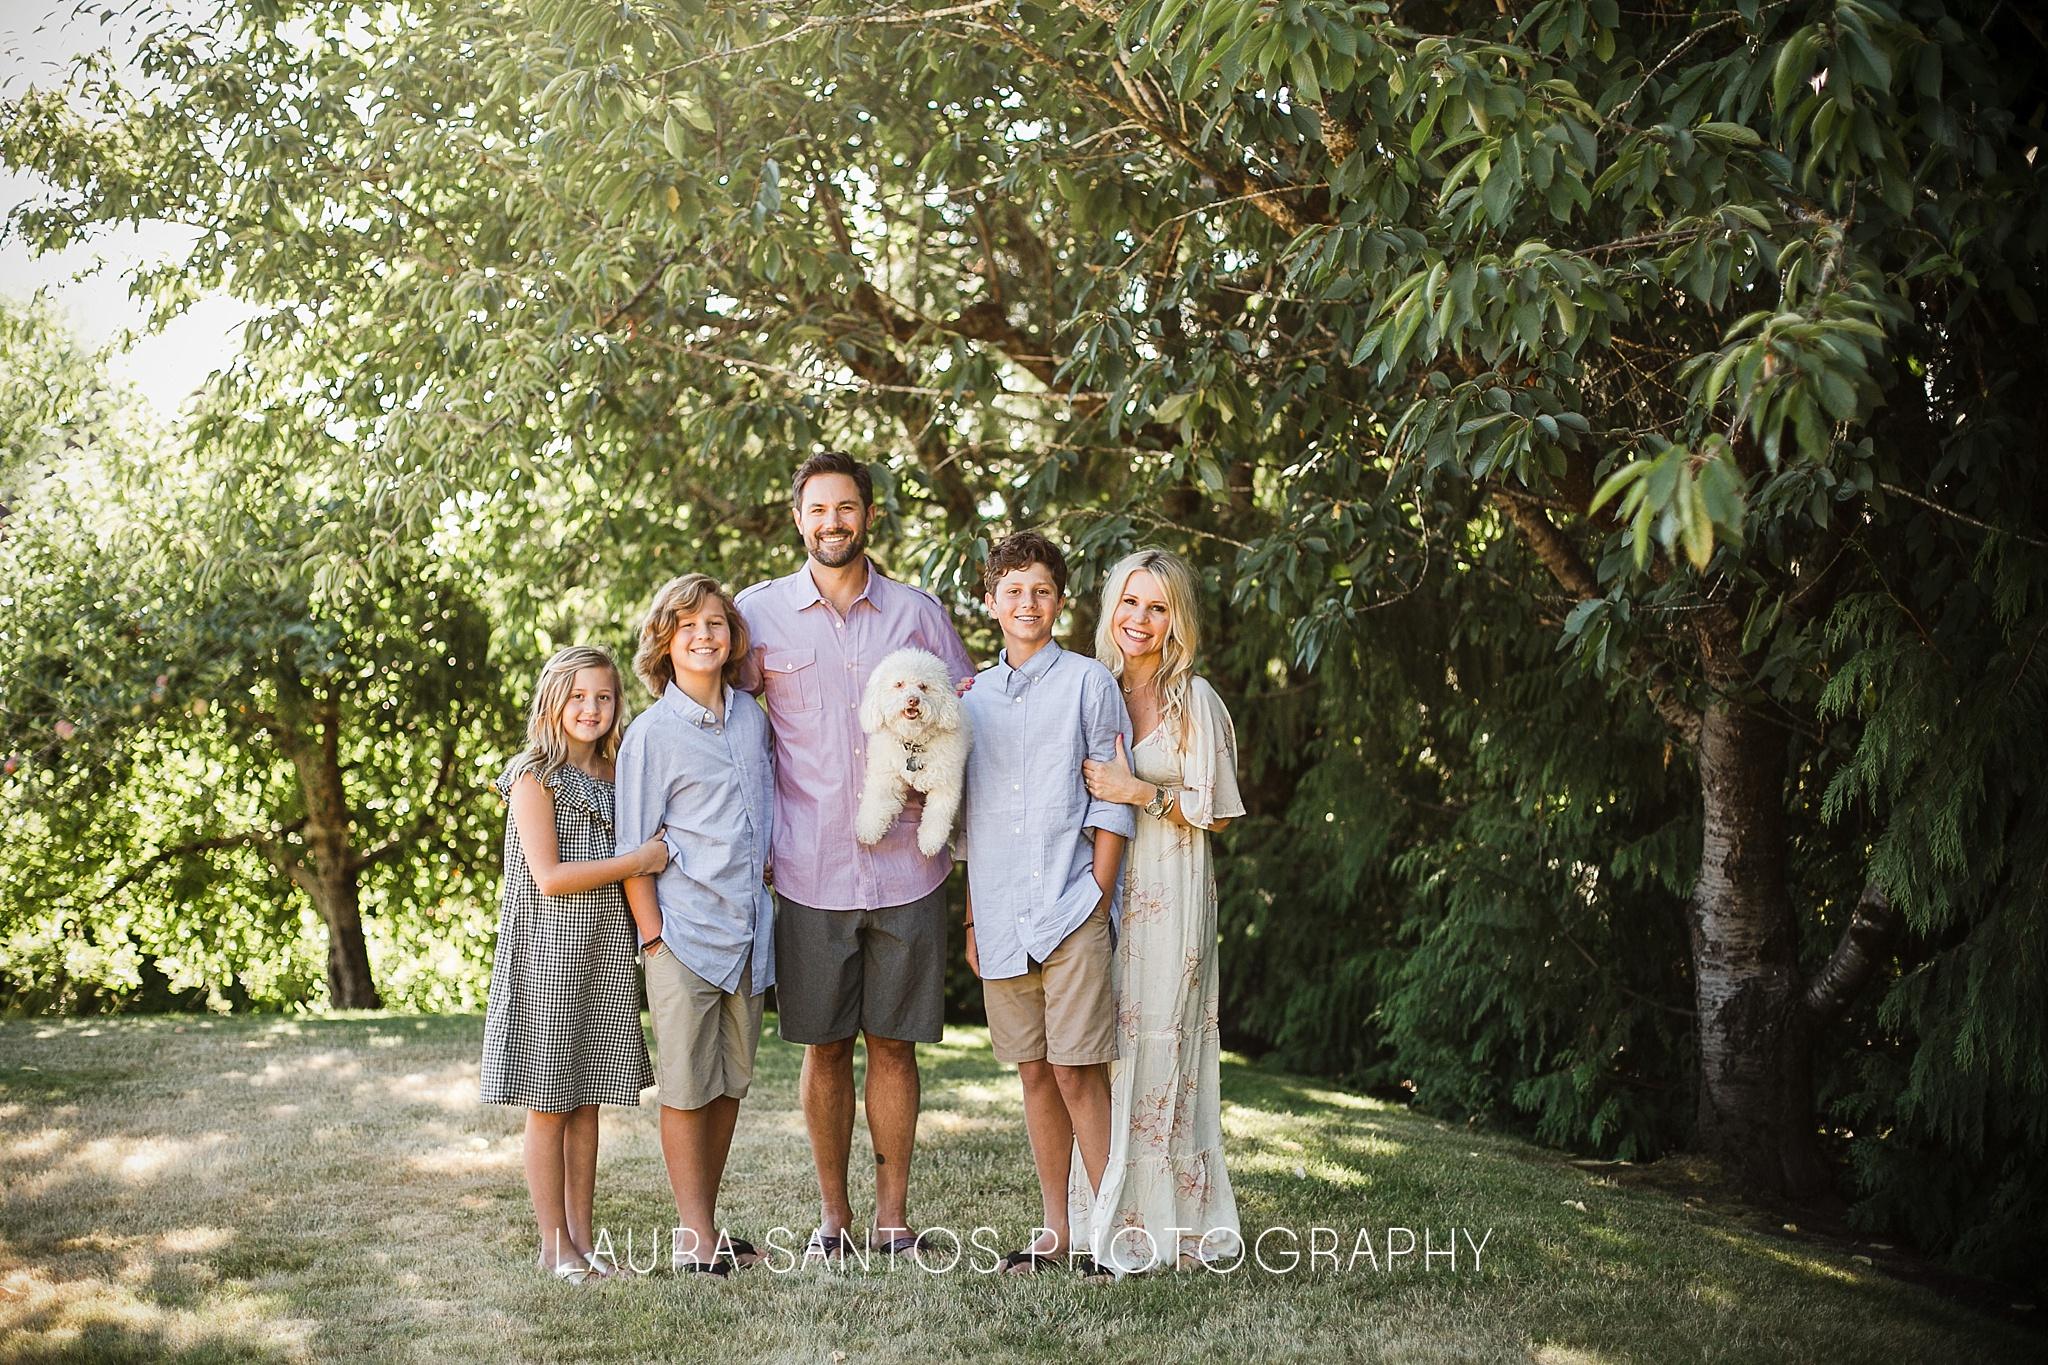 Laura Santos Photography Portland Oregon Family Photographer_0234.jpg